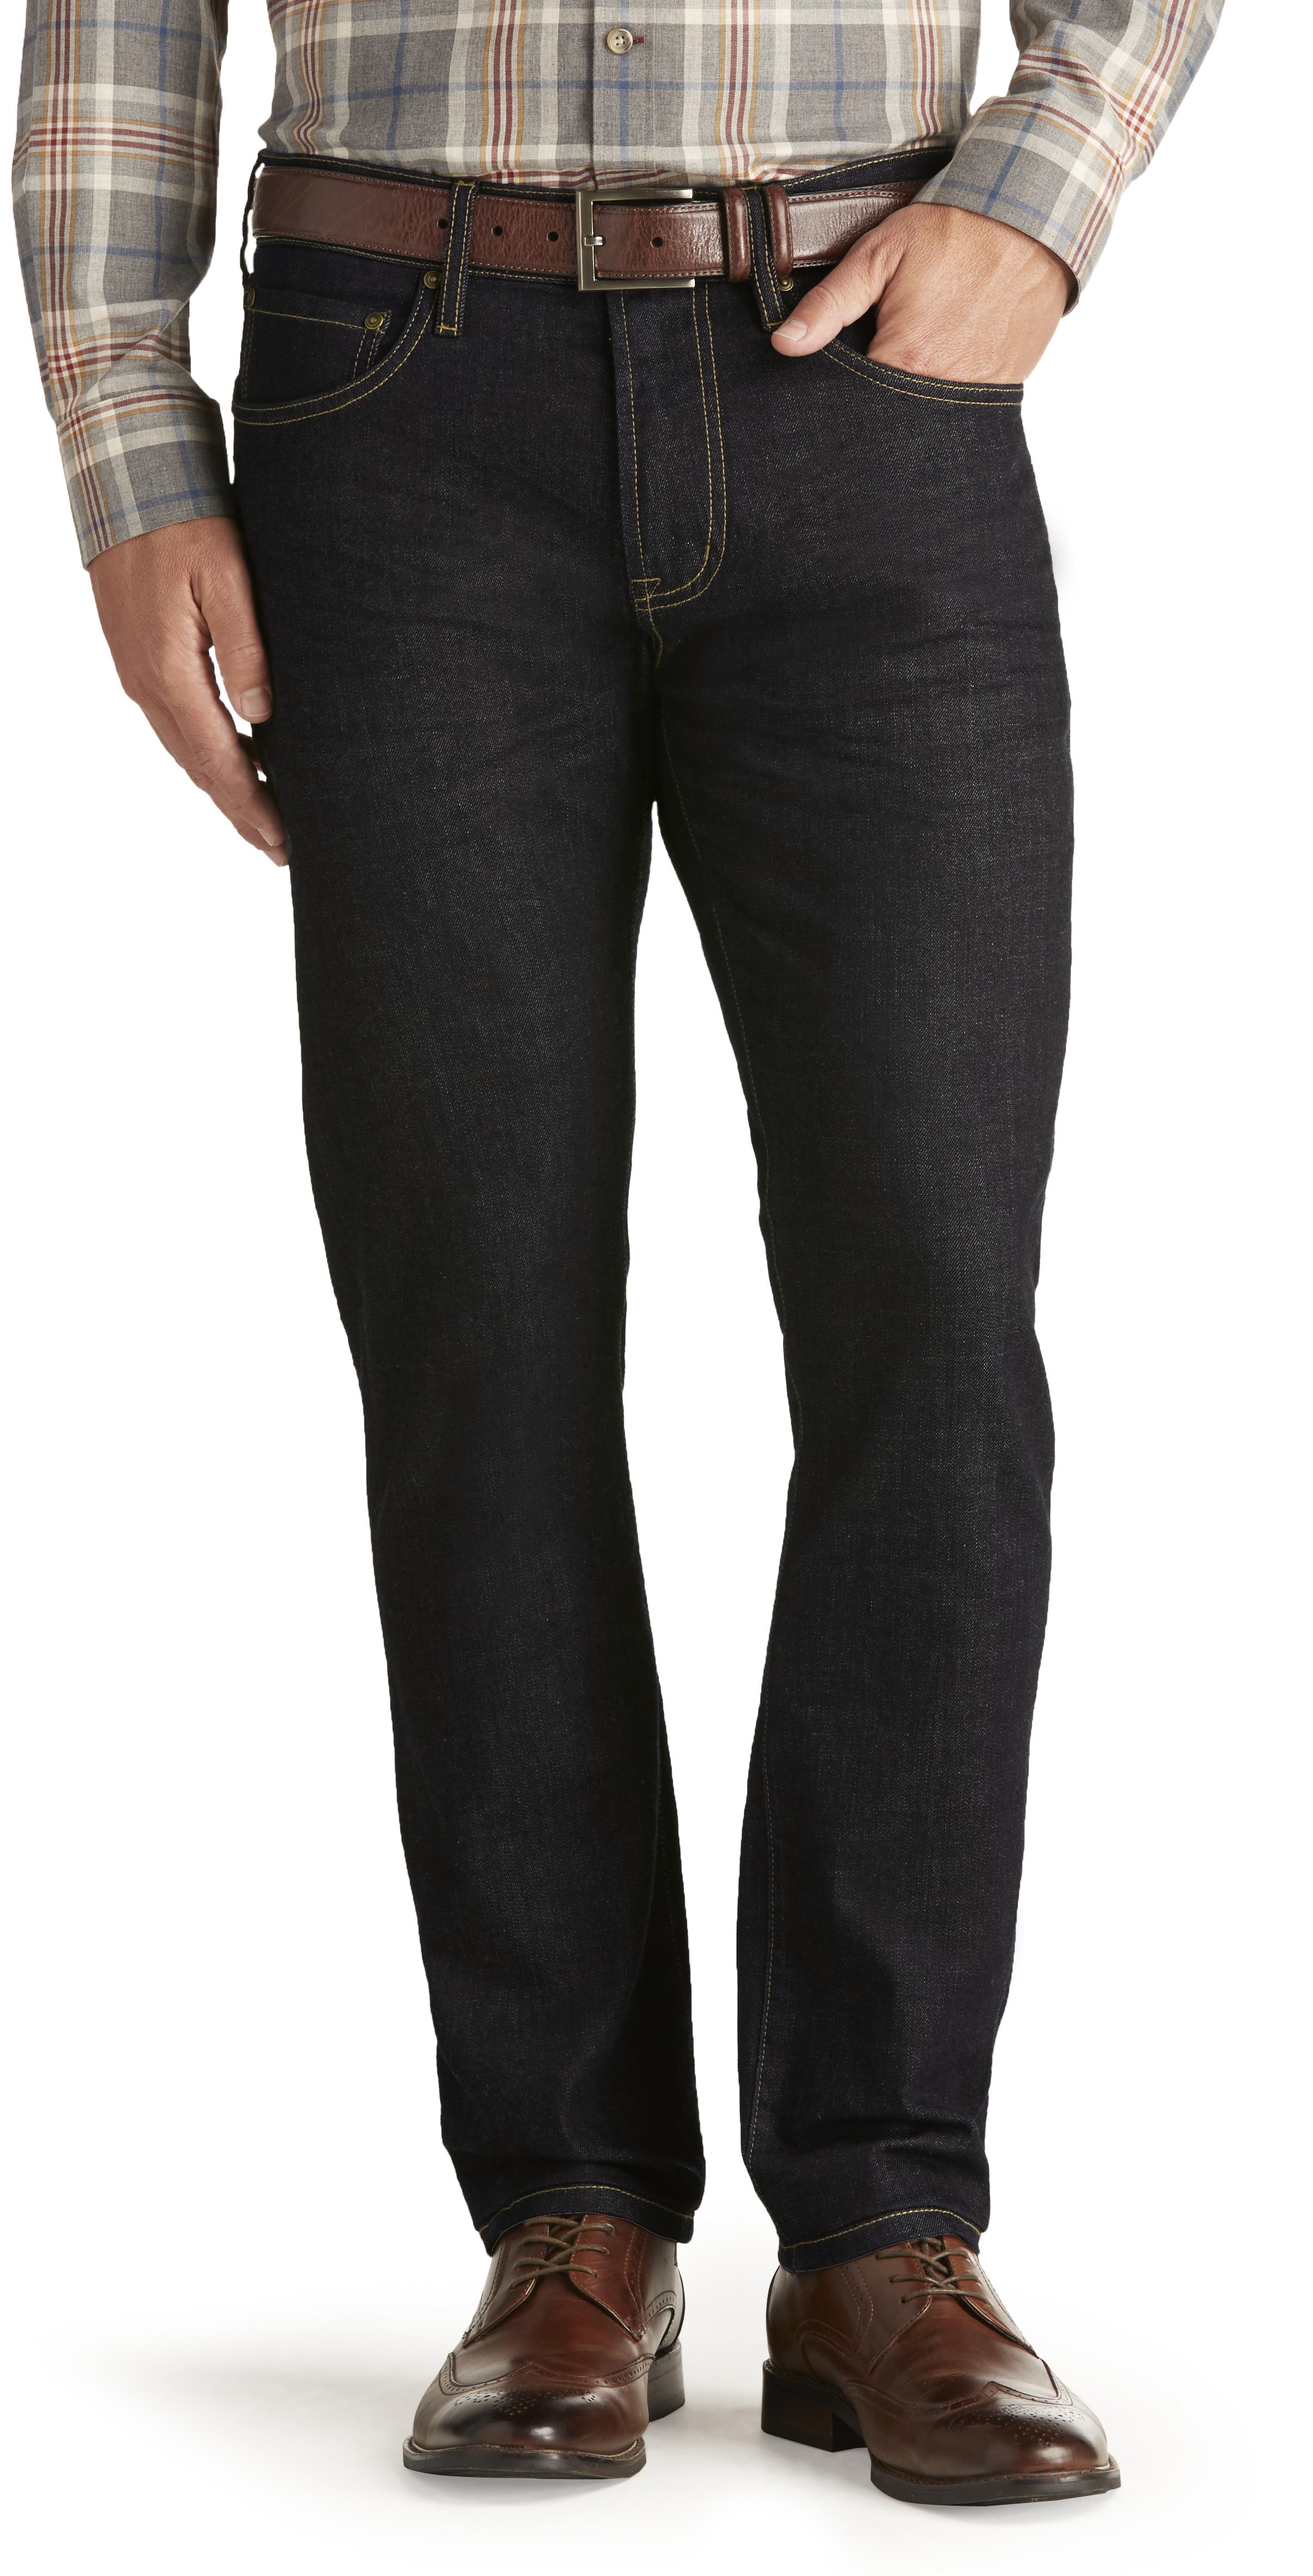 a77b1285b7f Joseph Abboud Slim Fit Dark Wash Jeans CLEARANCE - All Clearance | Jos A  Bank